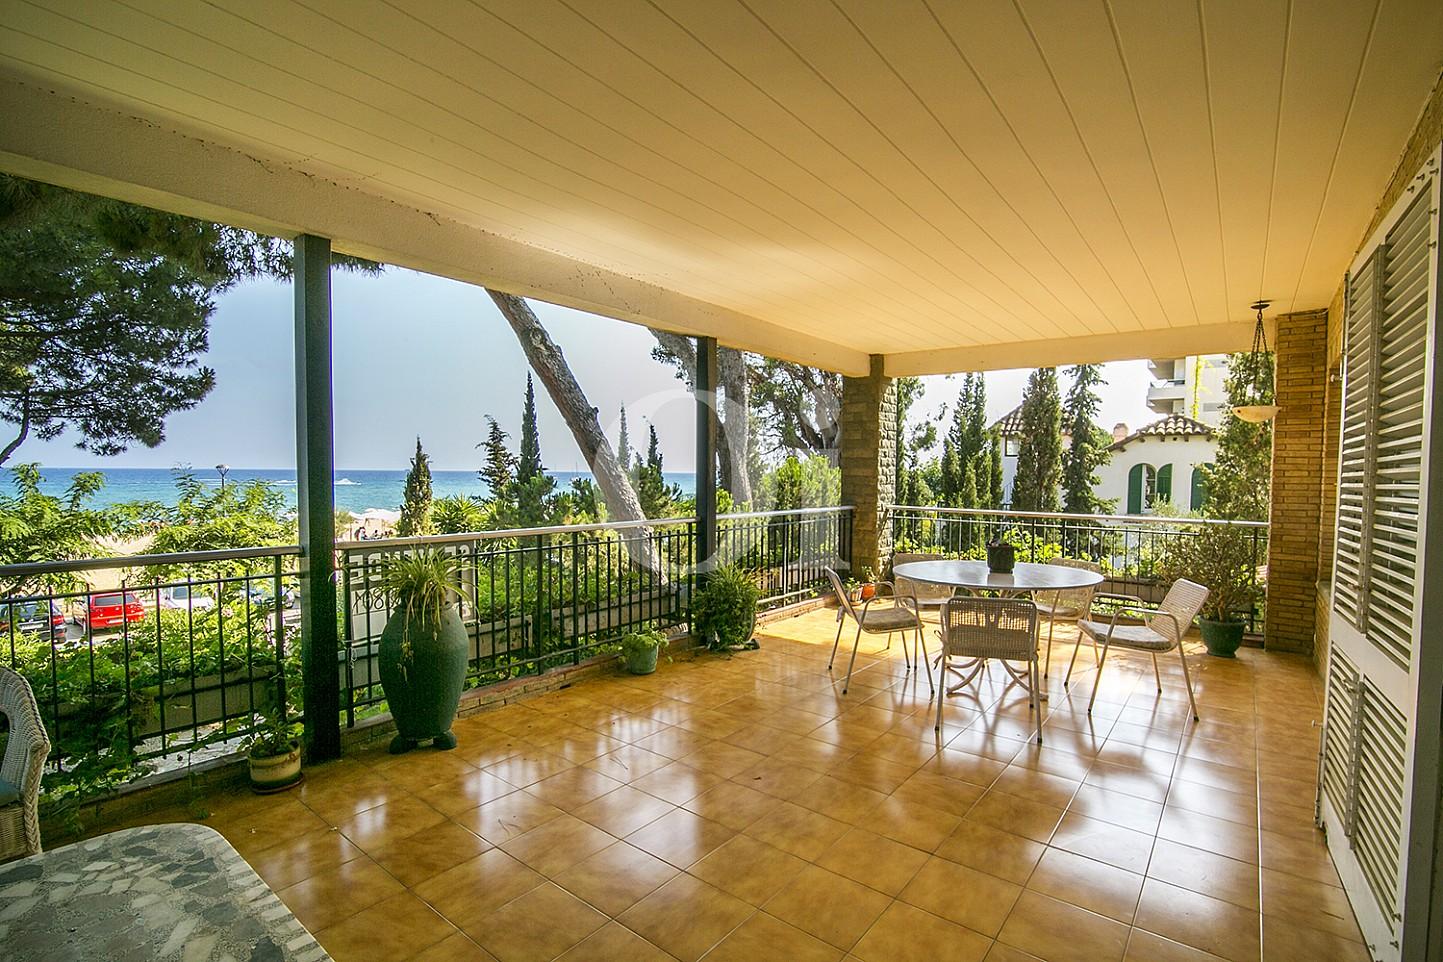 vistas de gran terraza exterior con sensacionales vistas a la naturaleza en Caldes d'Estrac